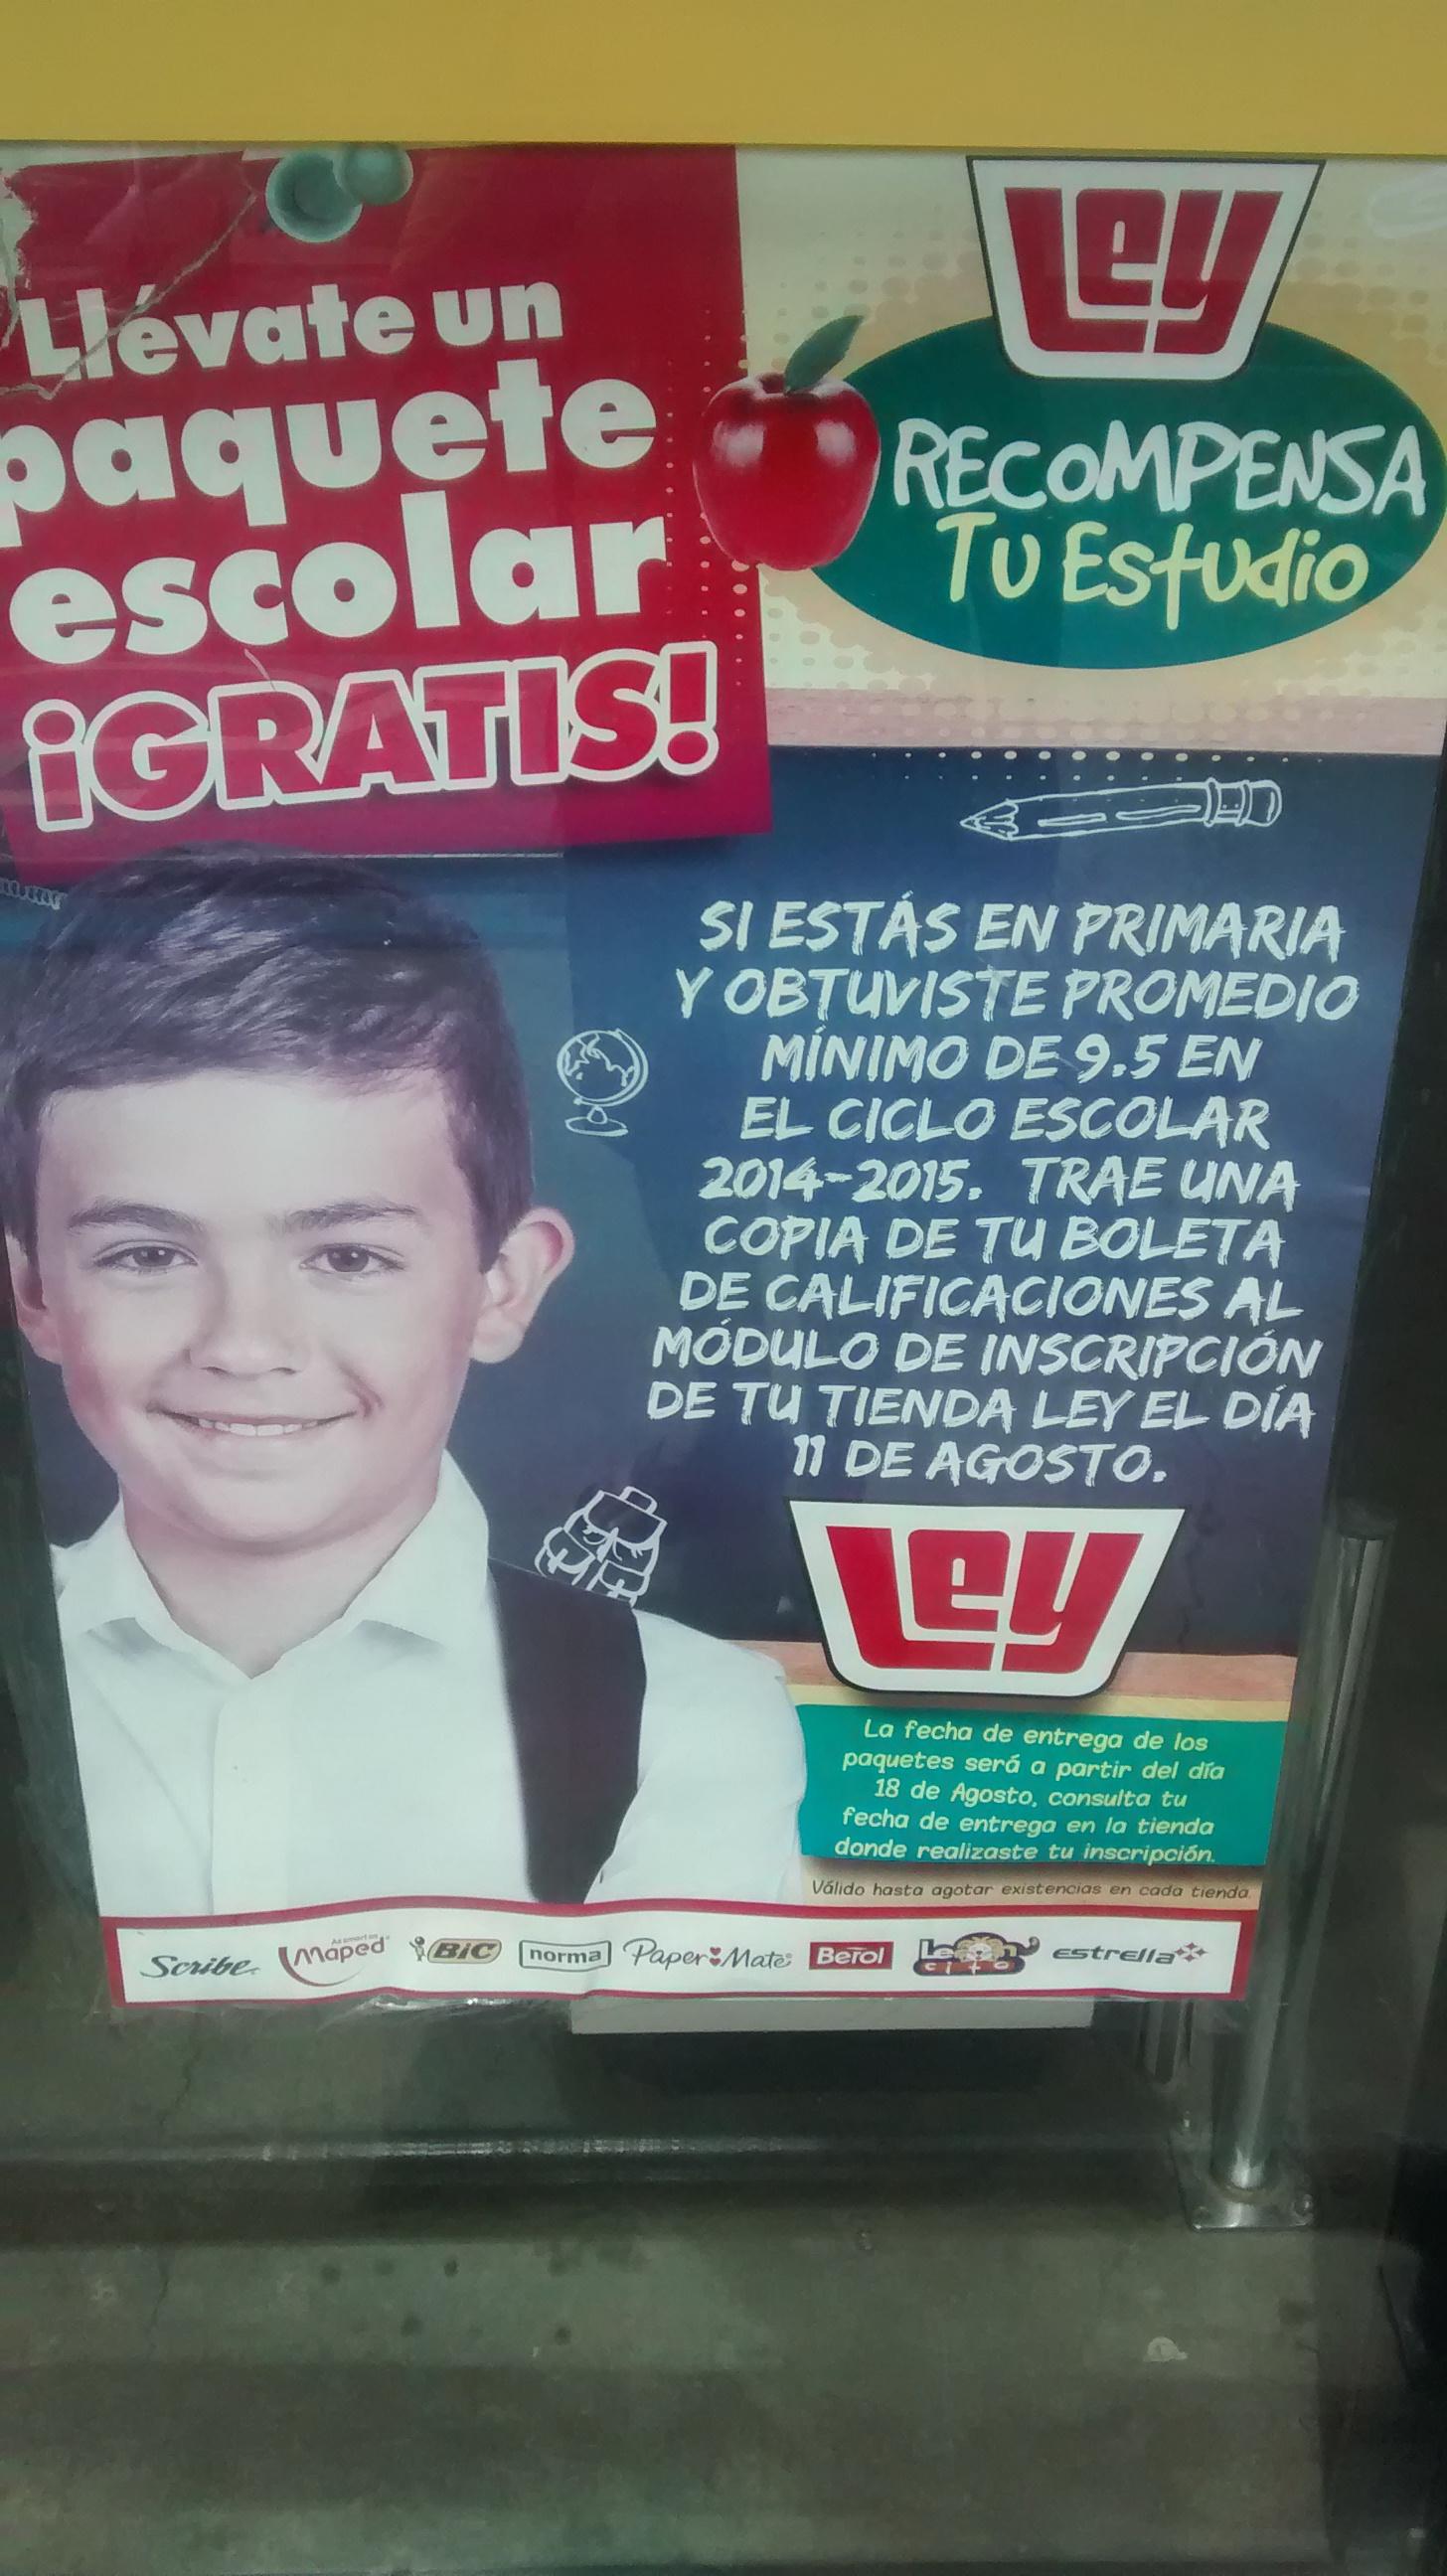 Casa Ley Supermercados (noroeste de México): Paquete escolar gratis con calificaciones de 9.5